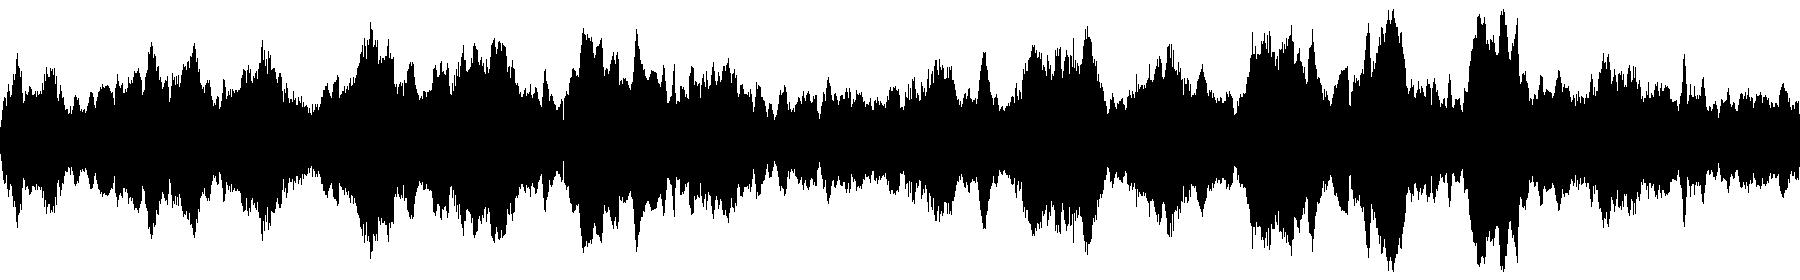 lofi ambient loop